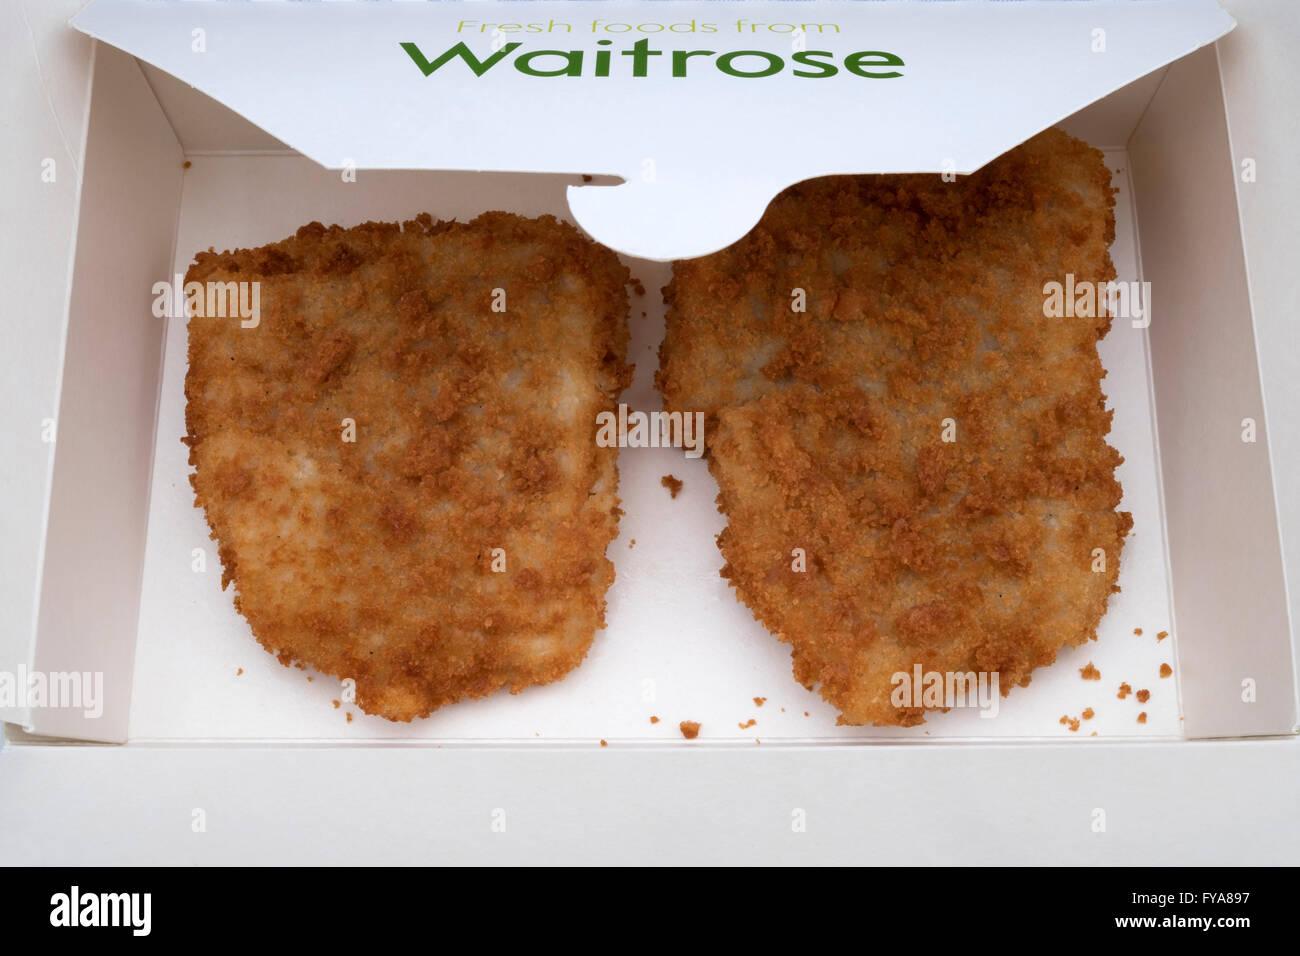 Waitrose fresh Cod breaded fish Stock Photo